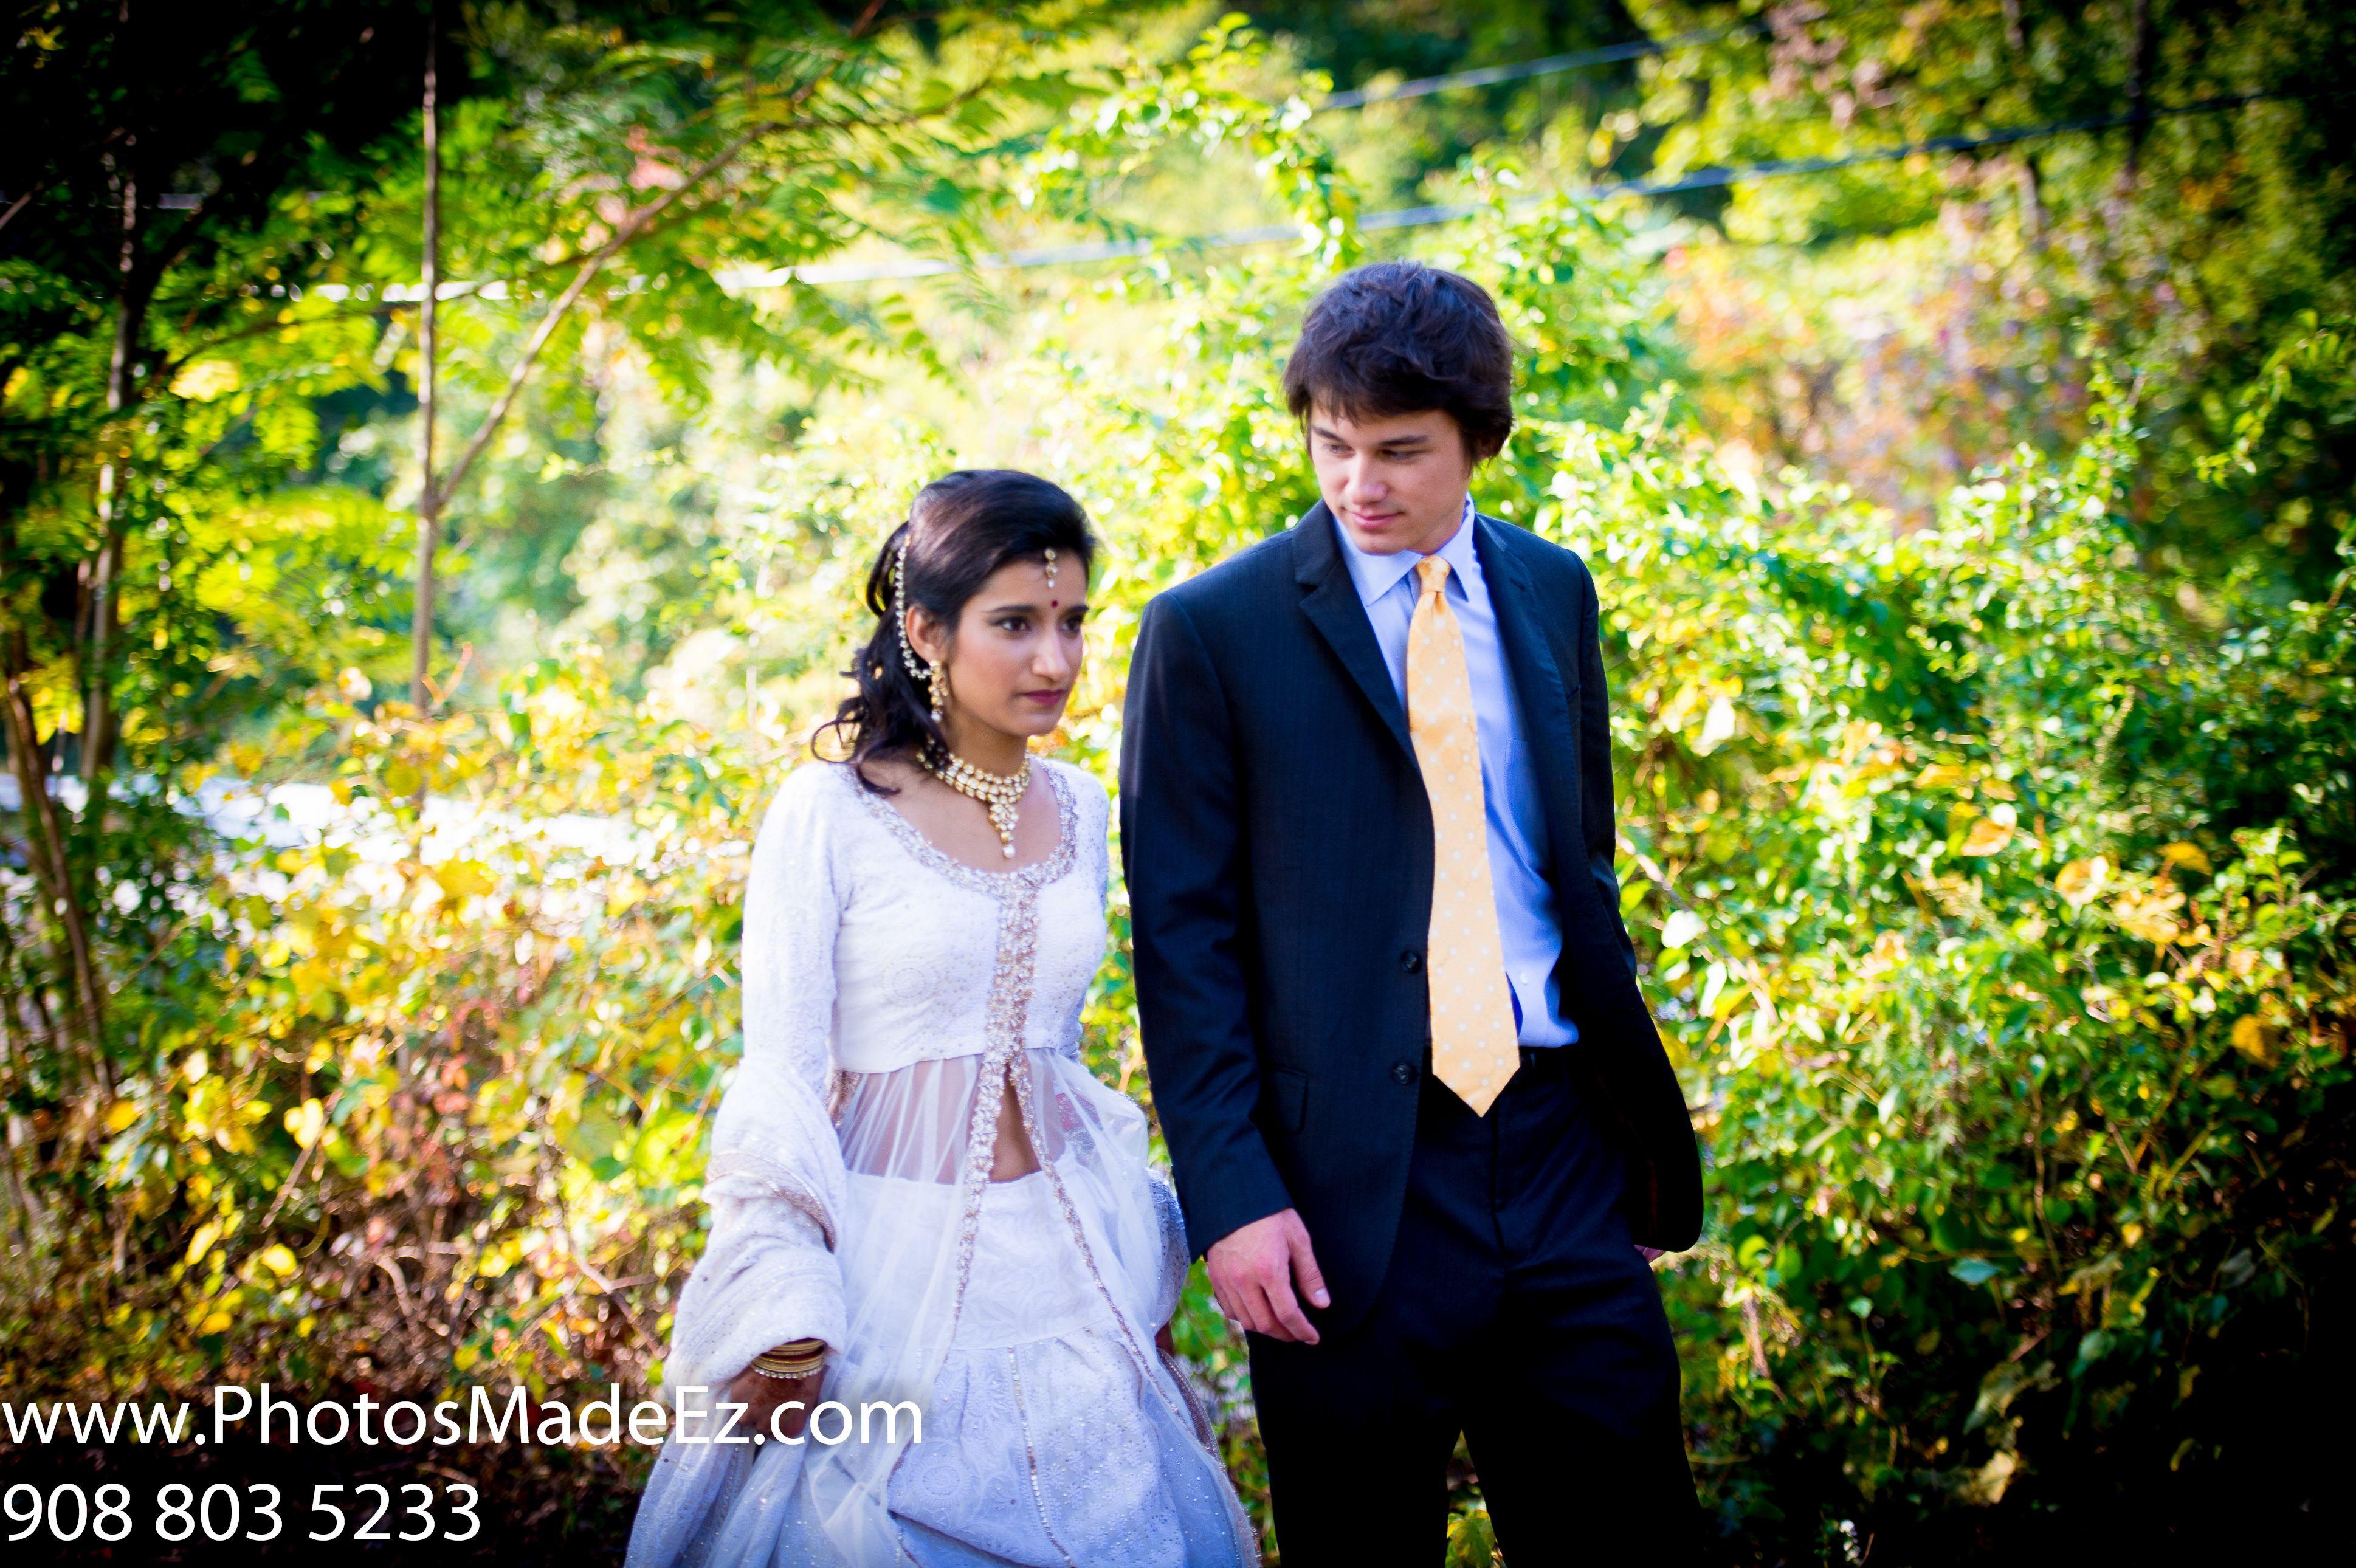 Wedding Portrait Photography NJ NY PA New Jersey Based Photographer Indian American